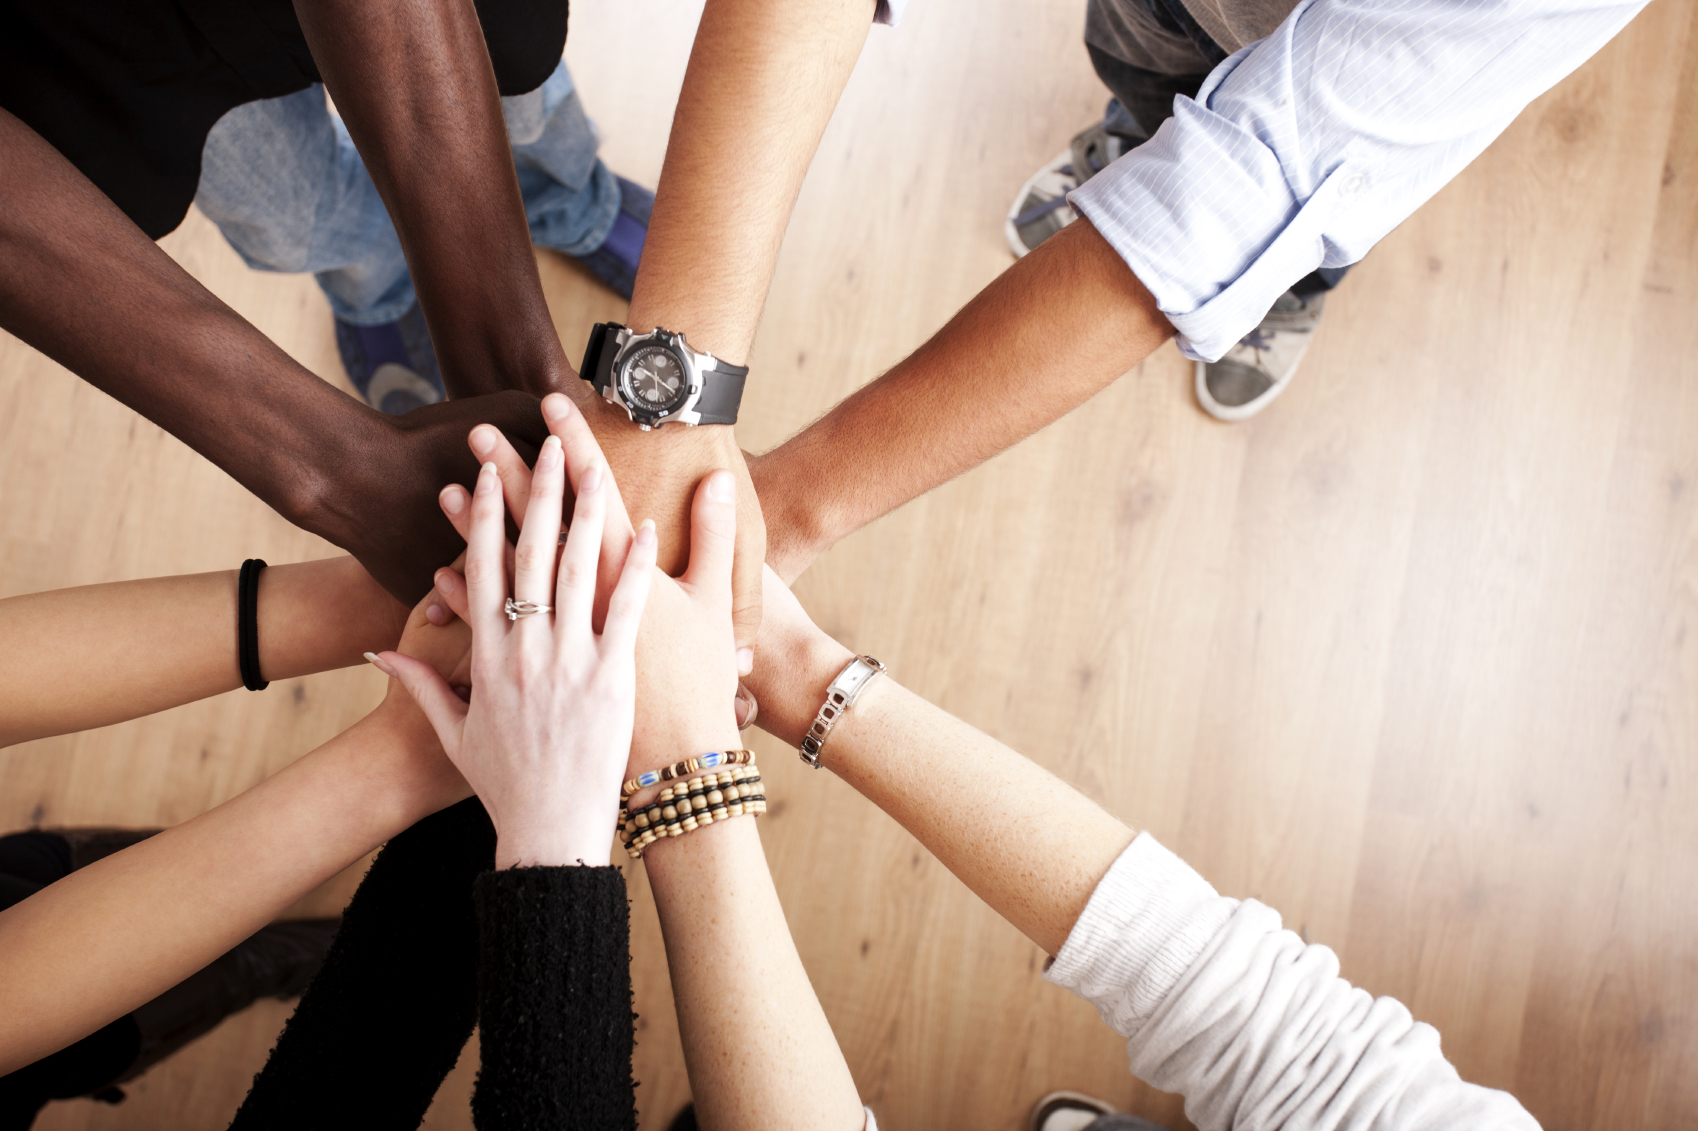 Paradigm Belonging and Inclusion